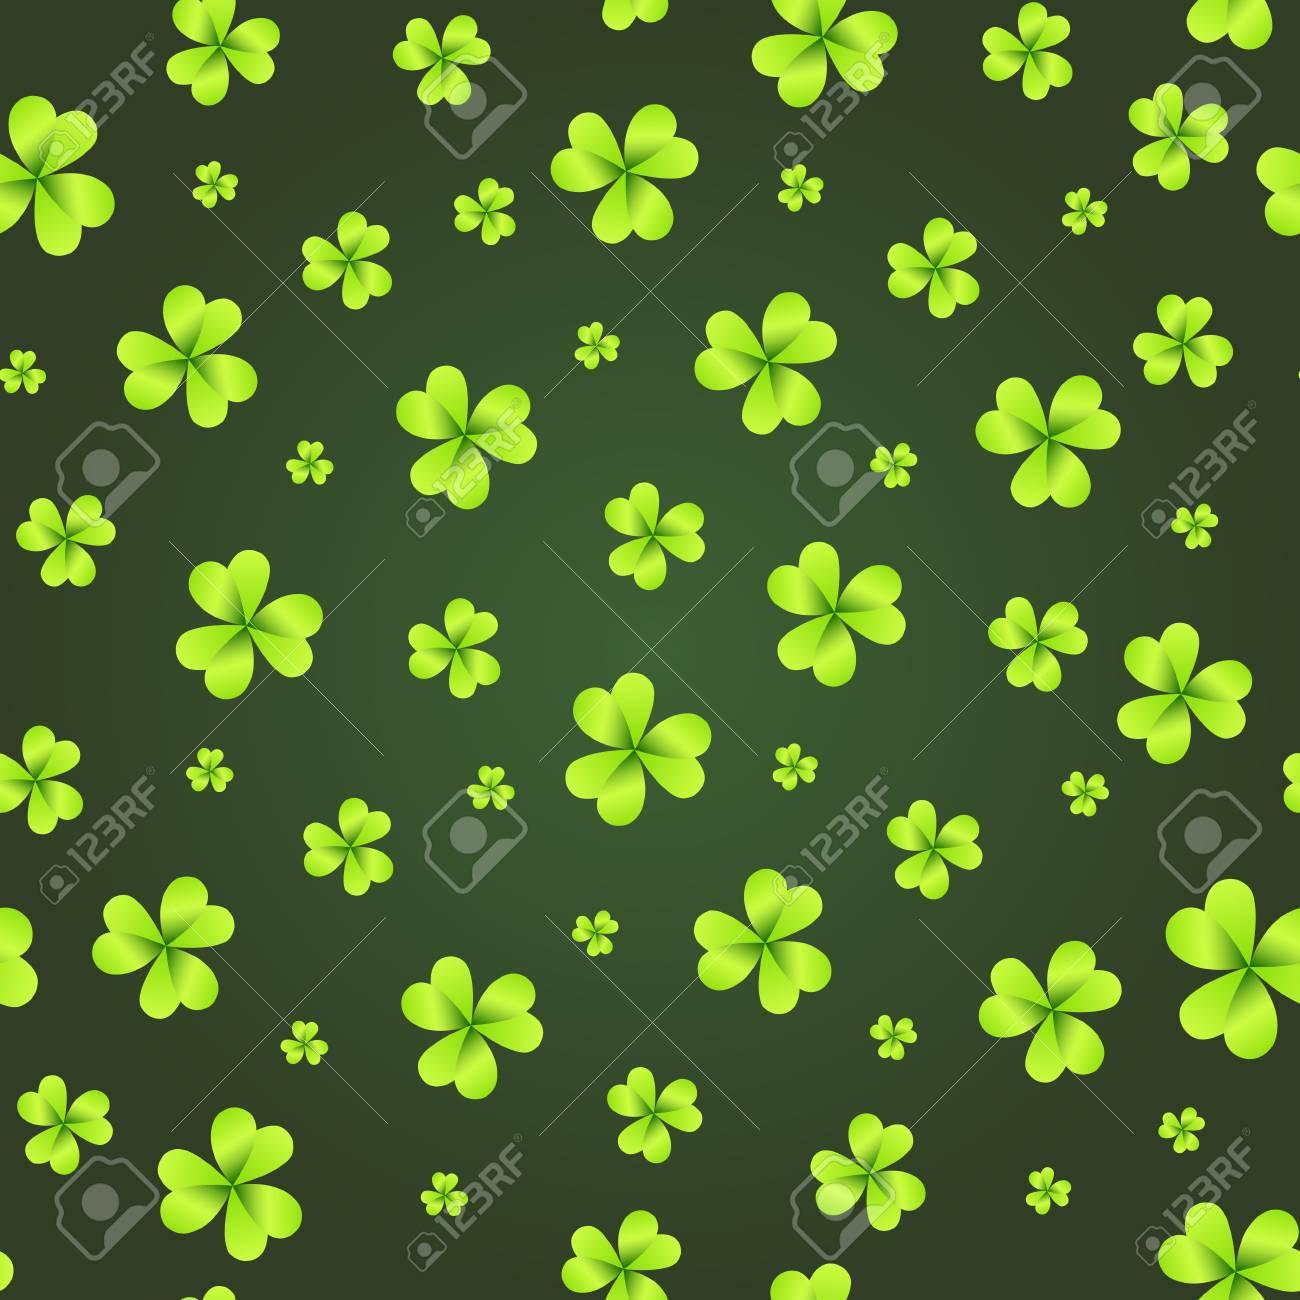 Shamrock Background St Patricks Day Wallpaper Seamless Pattern